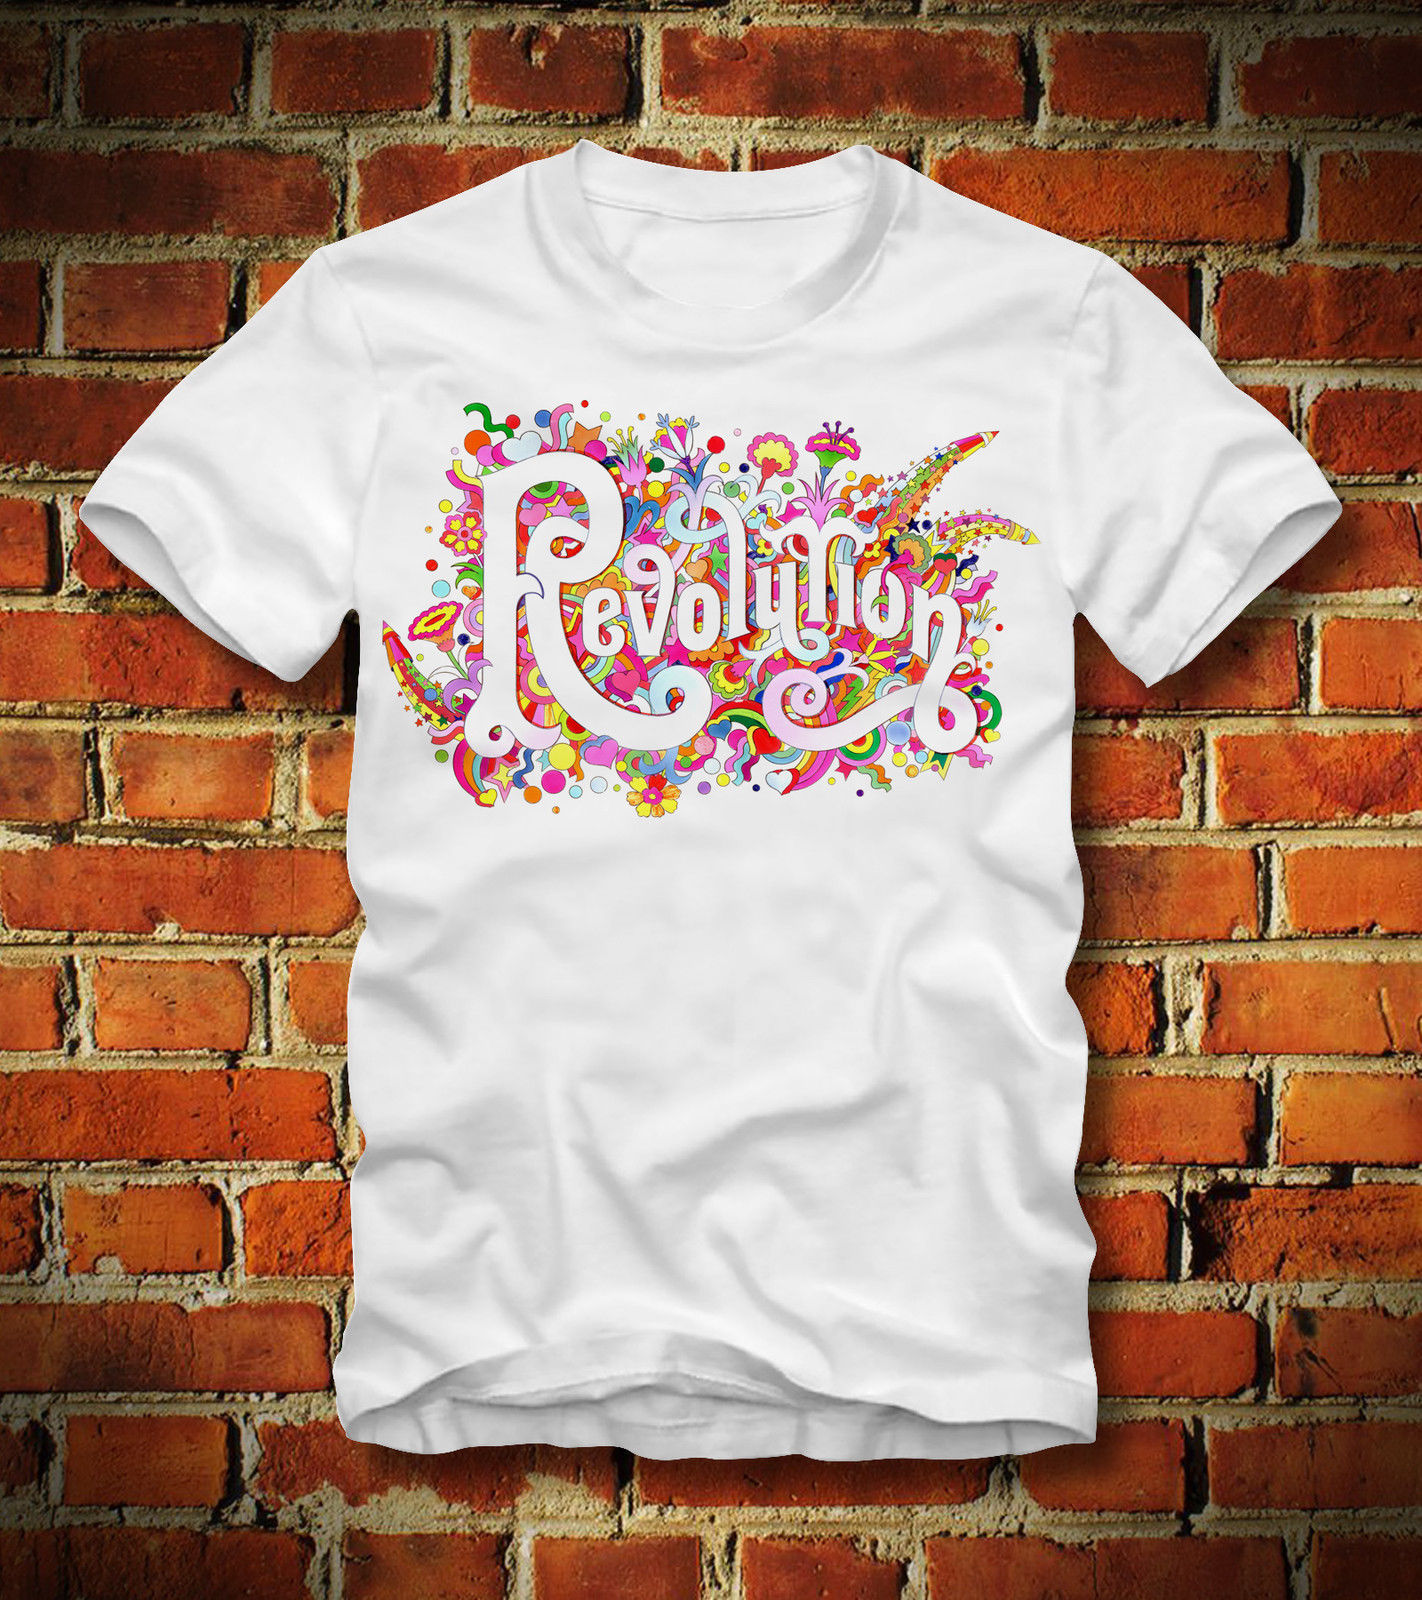 Camiseta revolución 60s 70s WOODSTOCK GROOVY HIPPIE flor poder LOVECartoon camiseta hombres Unisex nueva moda camiseta envío gratis